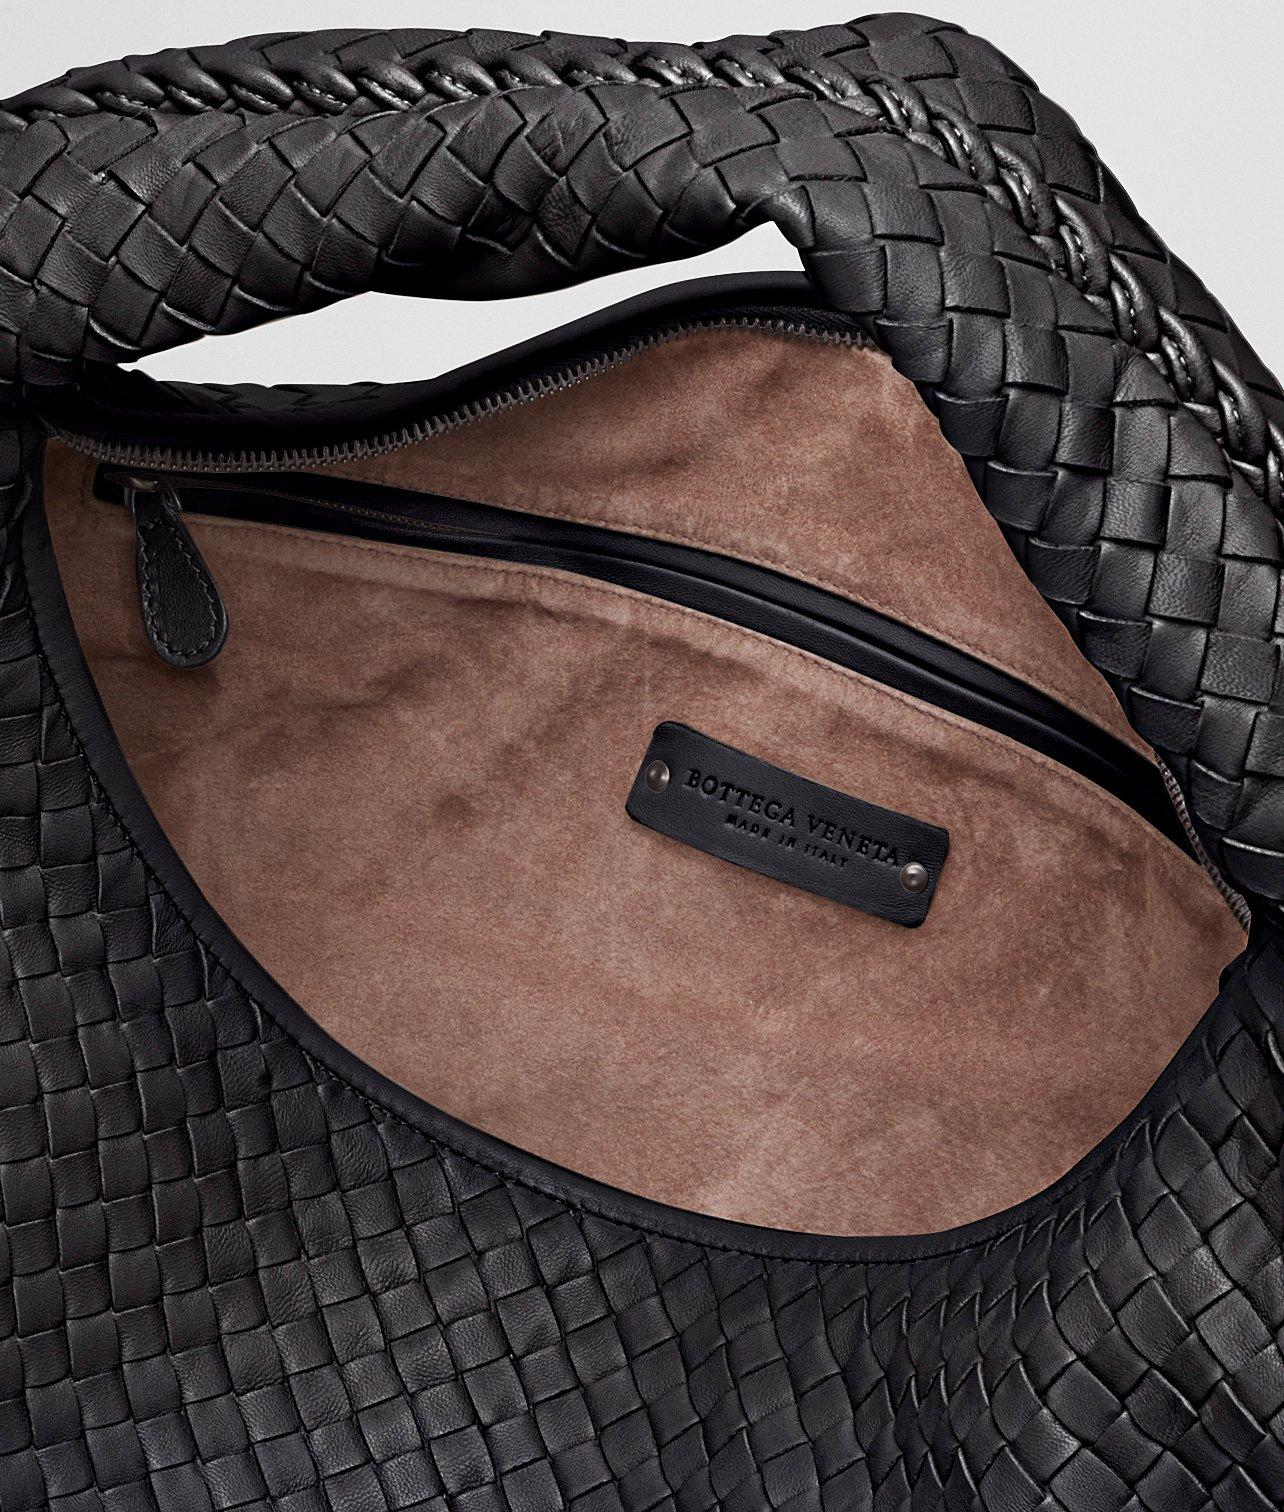 Lyst - Bottega Veneta Nero Intrecciato Nappa Maxi Veneta in Black f4dcfe50518ae